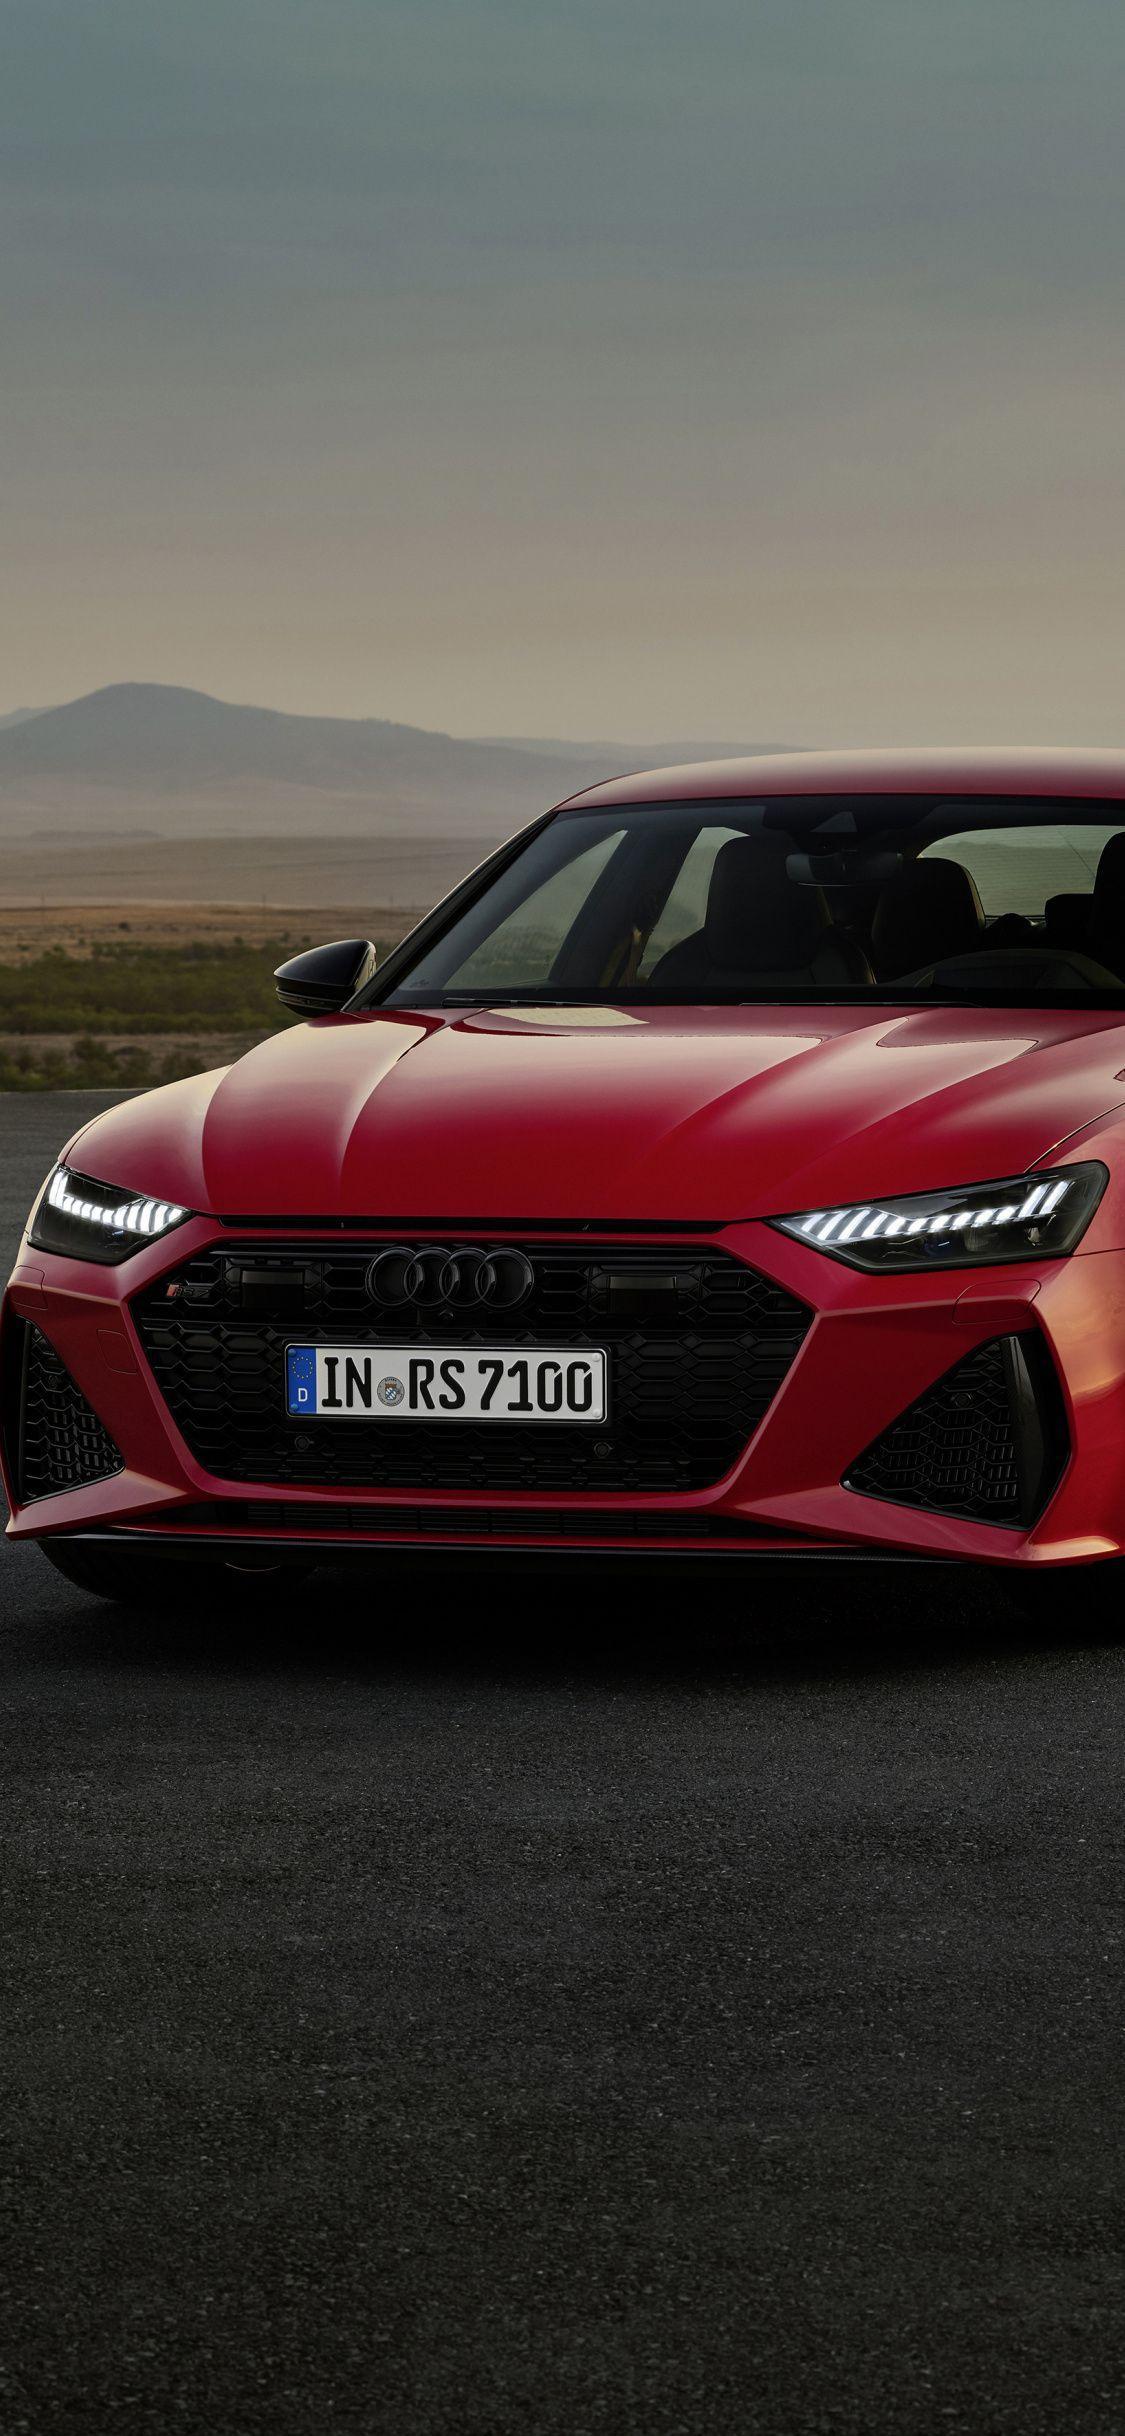 Audi Rs7 2020 Wallpapers Wallpaper Cave